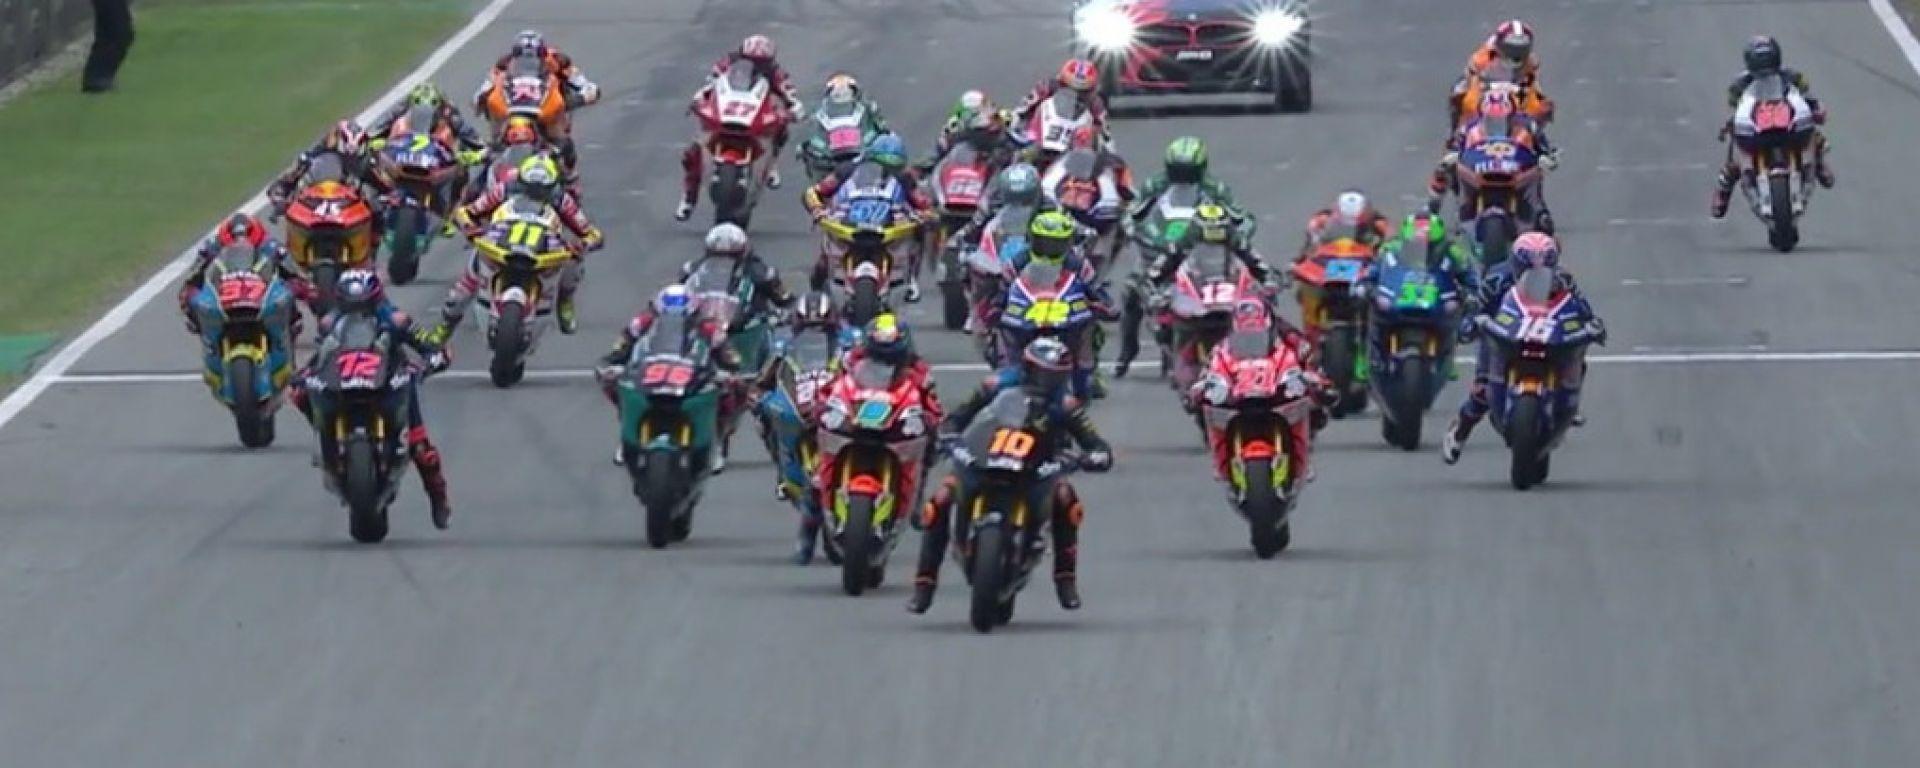 Moto2 Catalunya 2020, la partenza